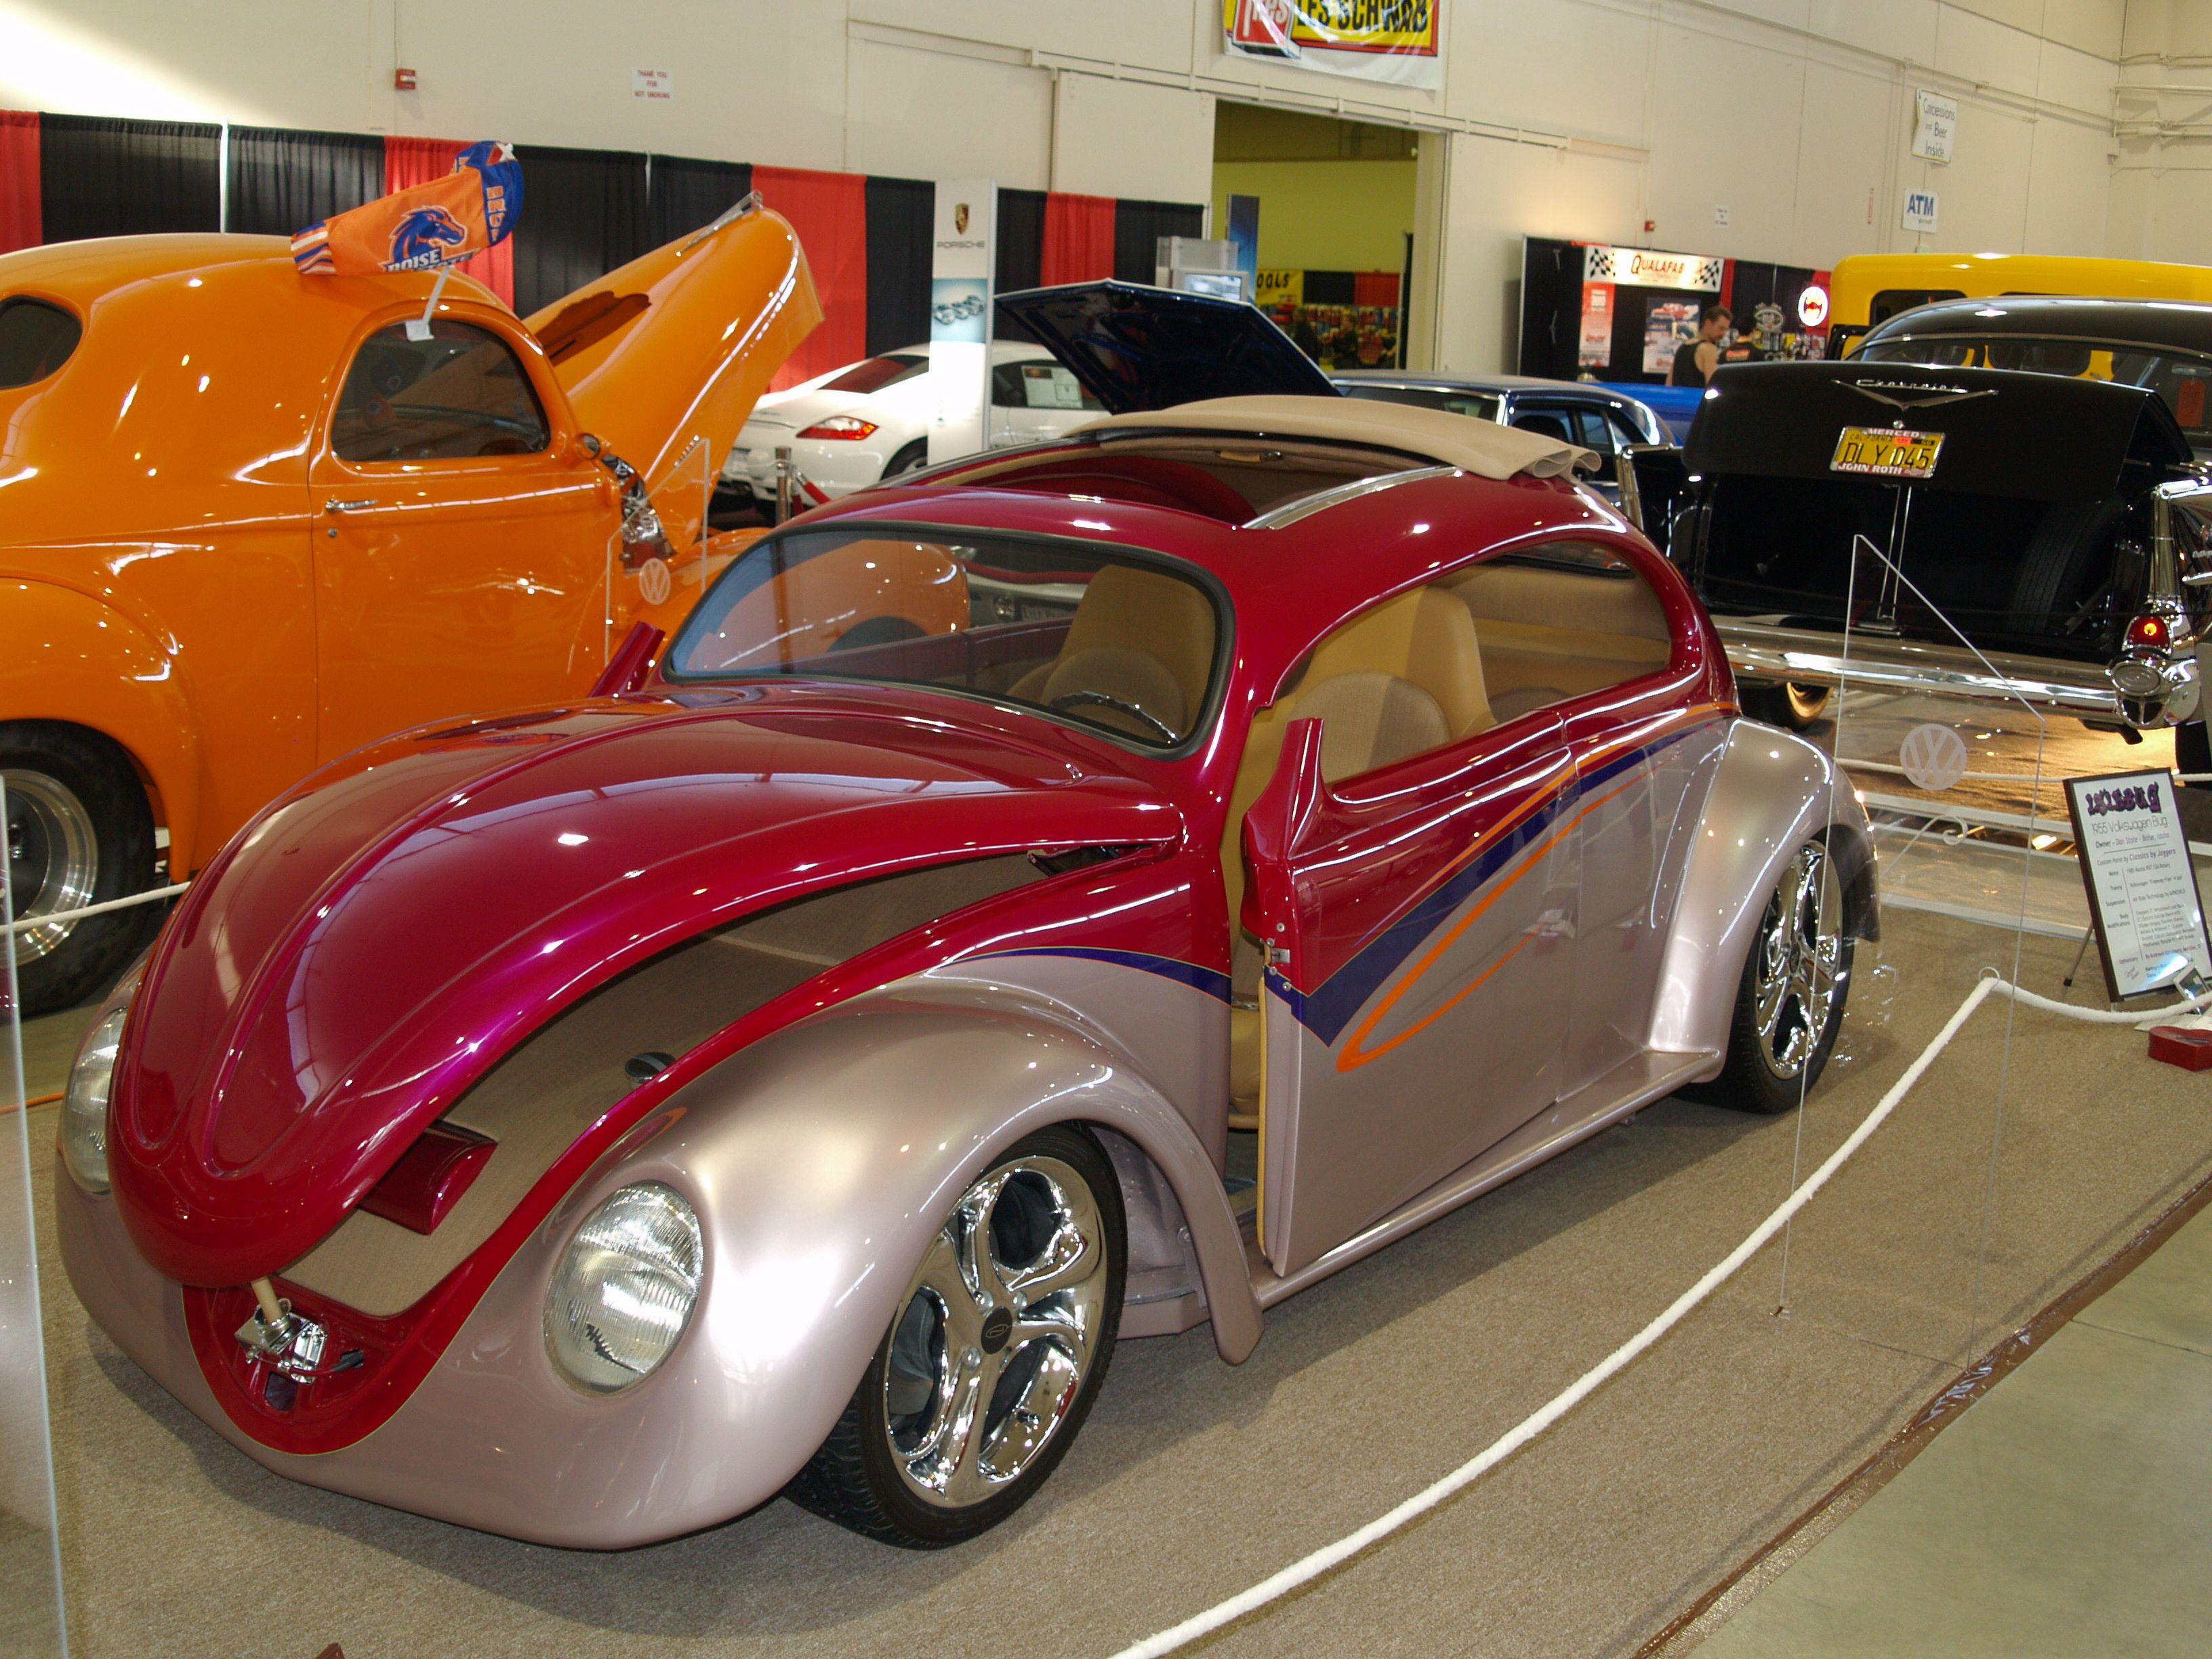 craigslist volkswagen it vw my pinterest beetle love i pink style beetles pin